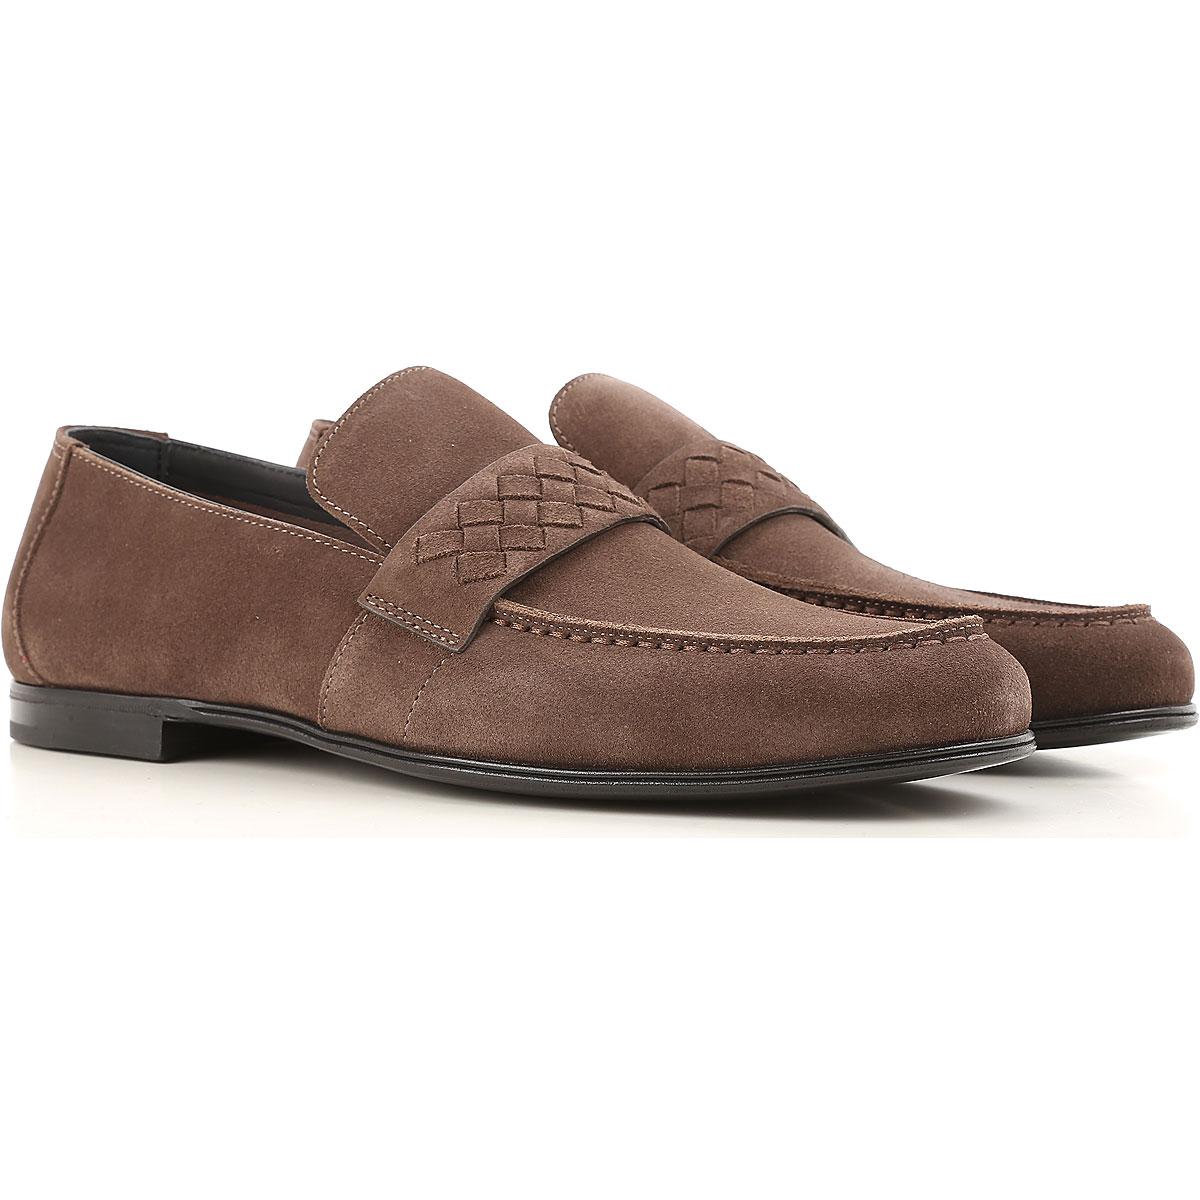 Image of Bottega Veneta Loafers for Men, Brownish-grey, Suede leather, 2017, 10 10.25 10.5 7.5 7.75 8 8.5 9.5